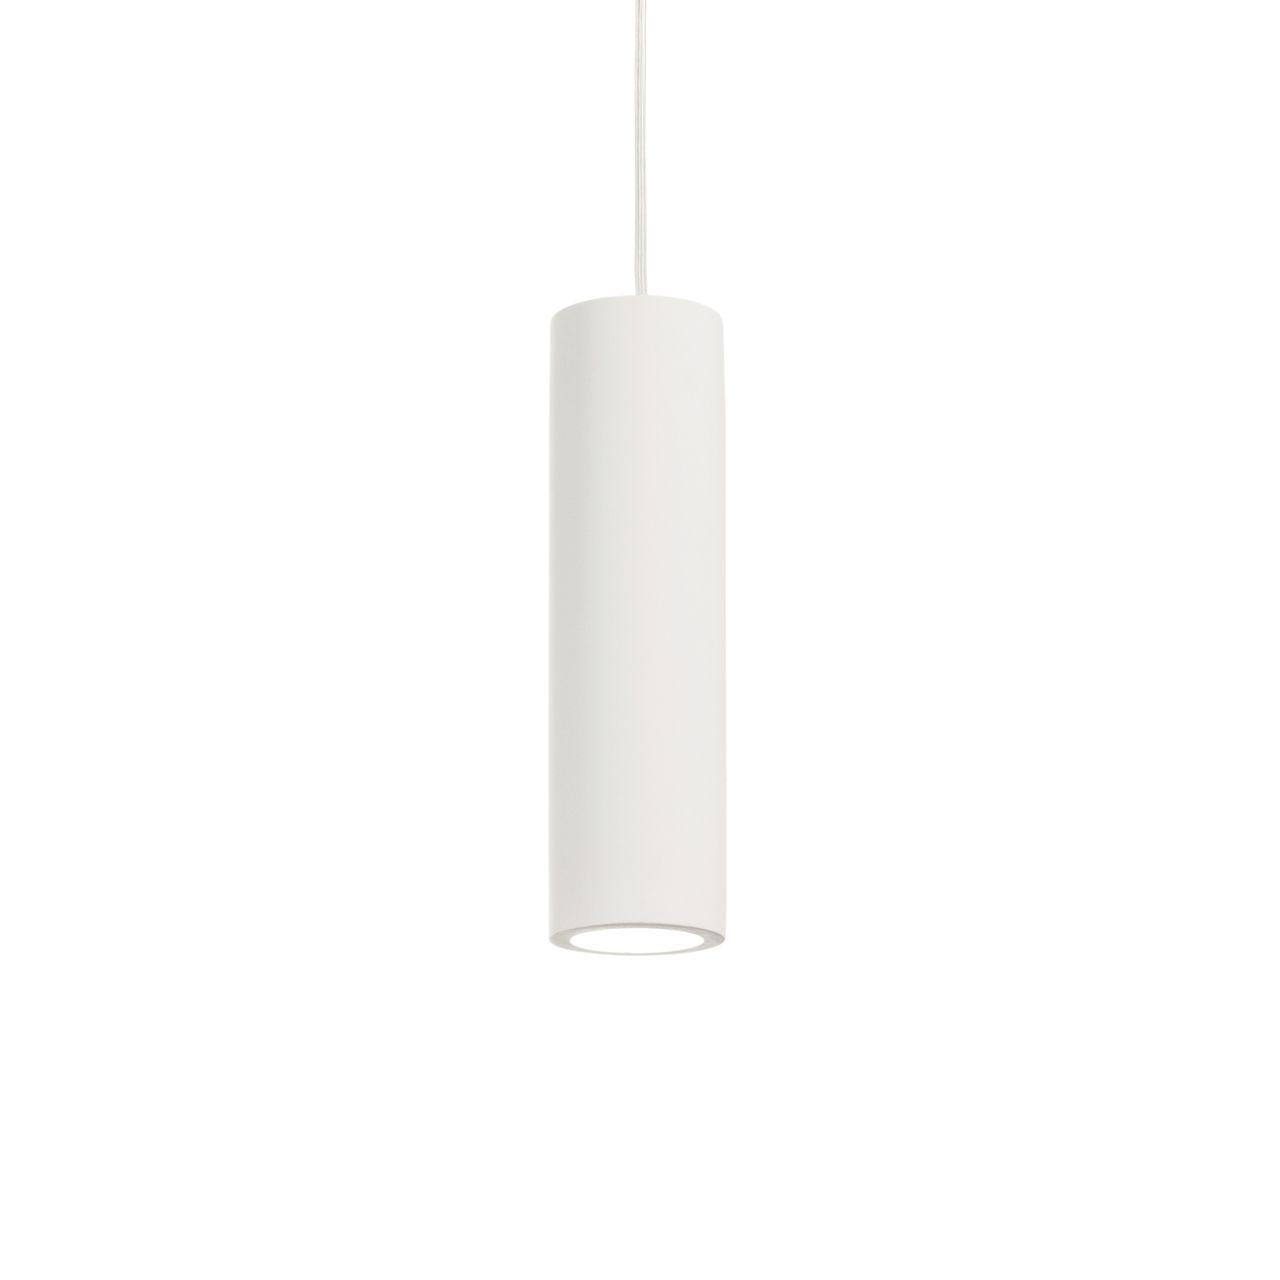 Подвесной светильник Ideal Lux Oak SP1 Round Bianco ideal record valley oak 601l 4м